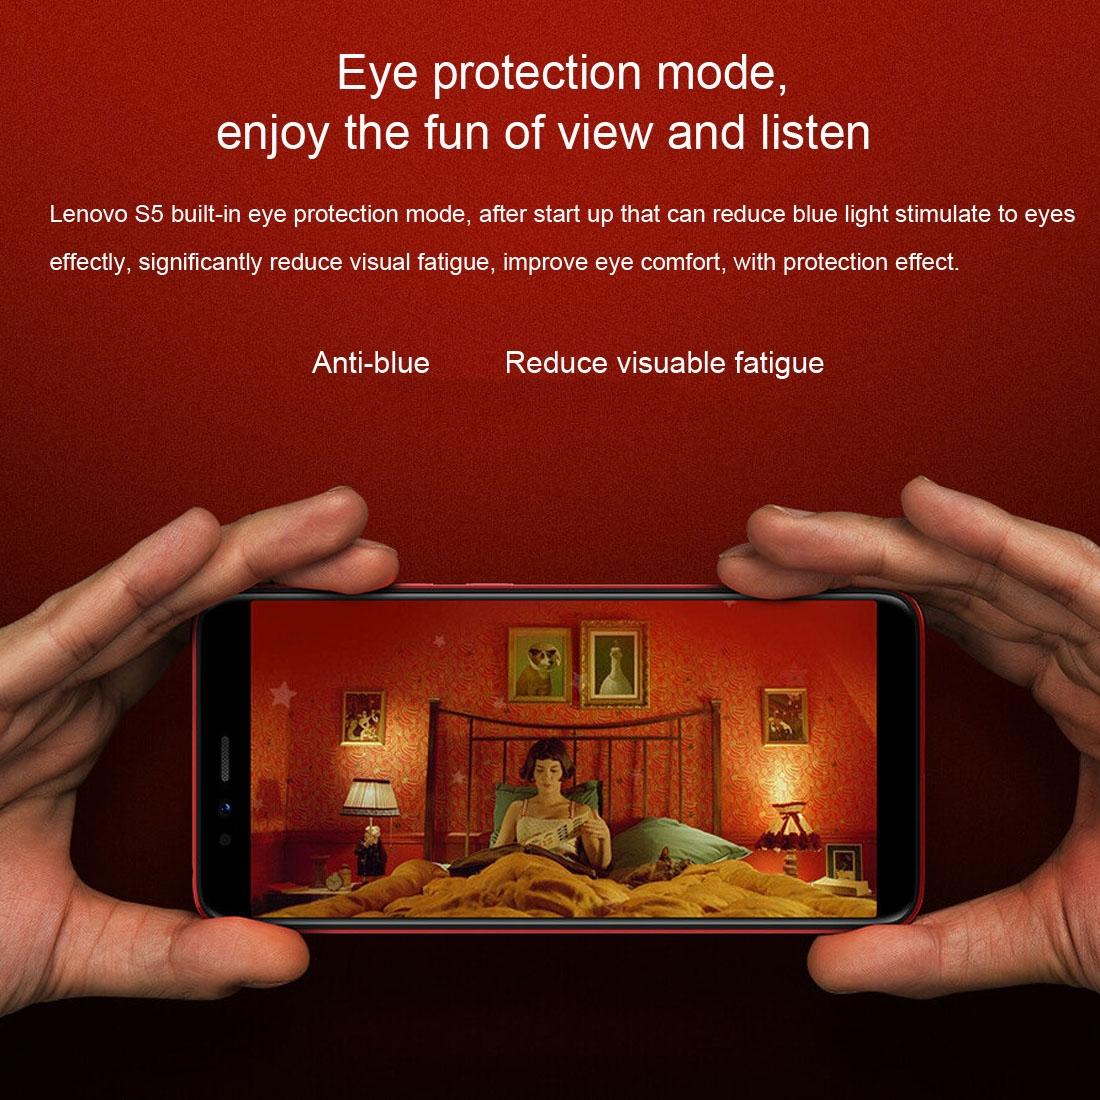 i.ibb.co/S3RCYfp/Smartphone-Celular-3-GB-RAM-32-GB-ROM-Lenovo-S5-K520-12.jpg